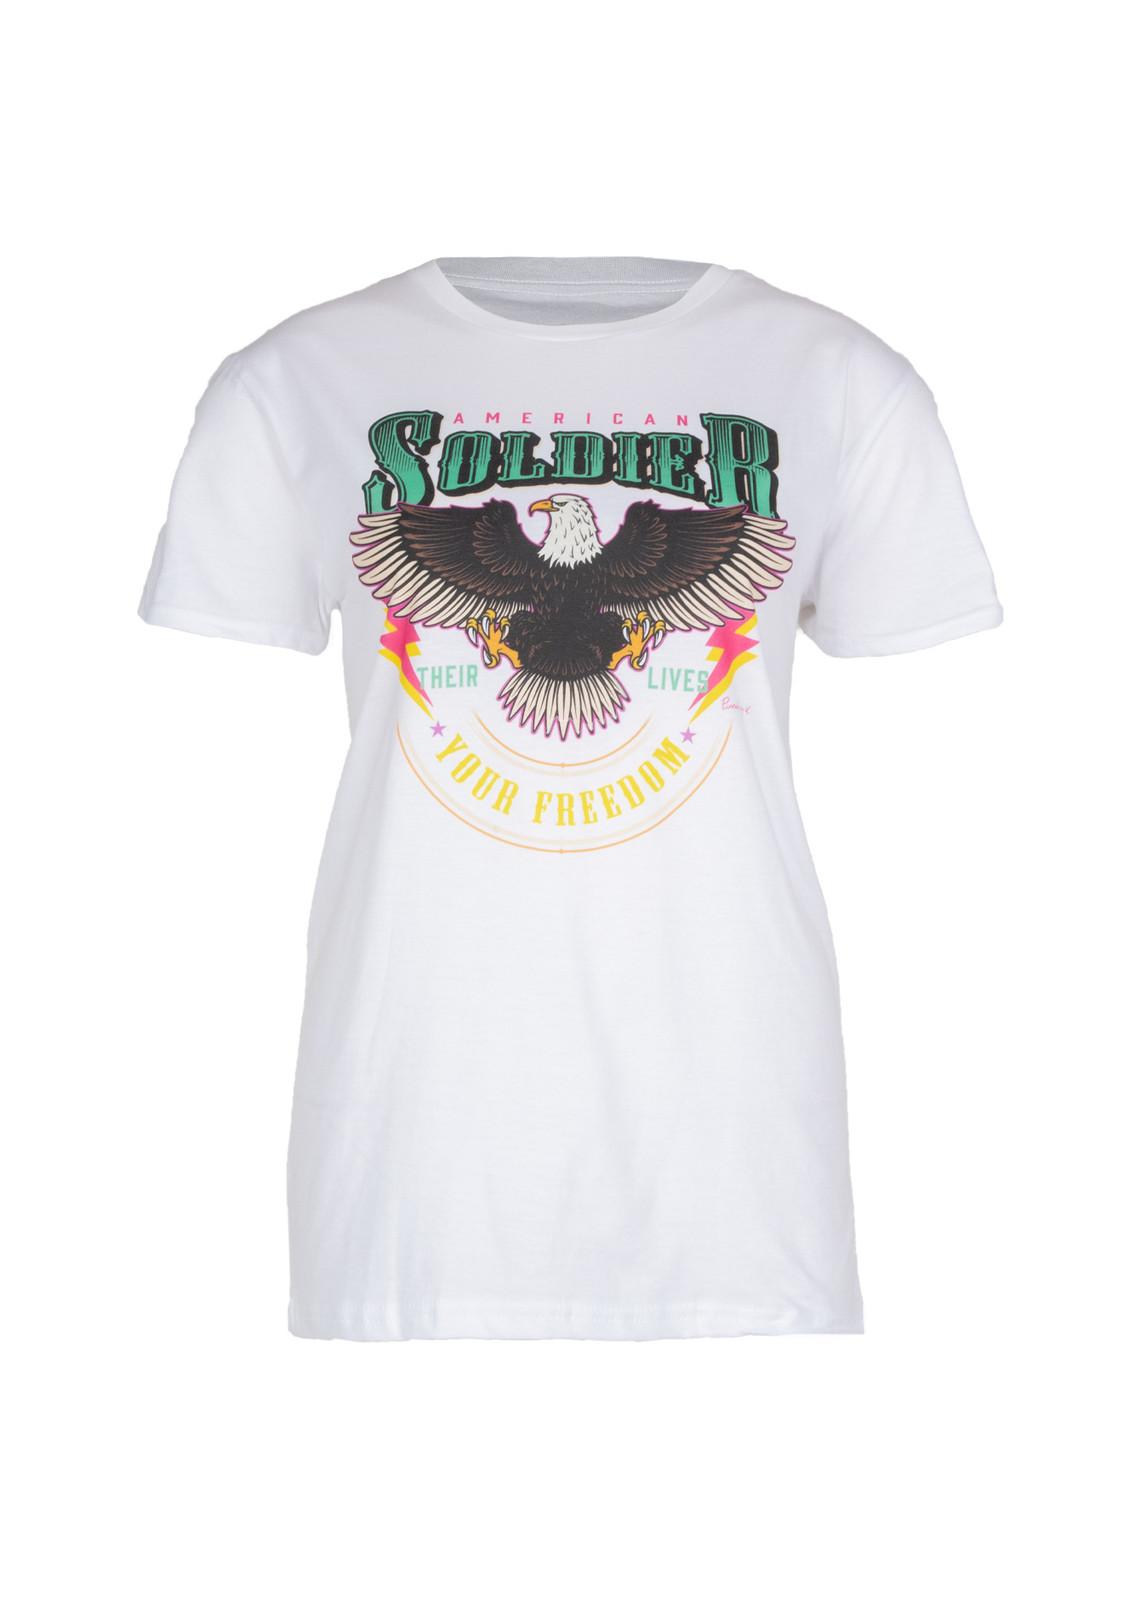 T-shirt Soldier white